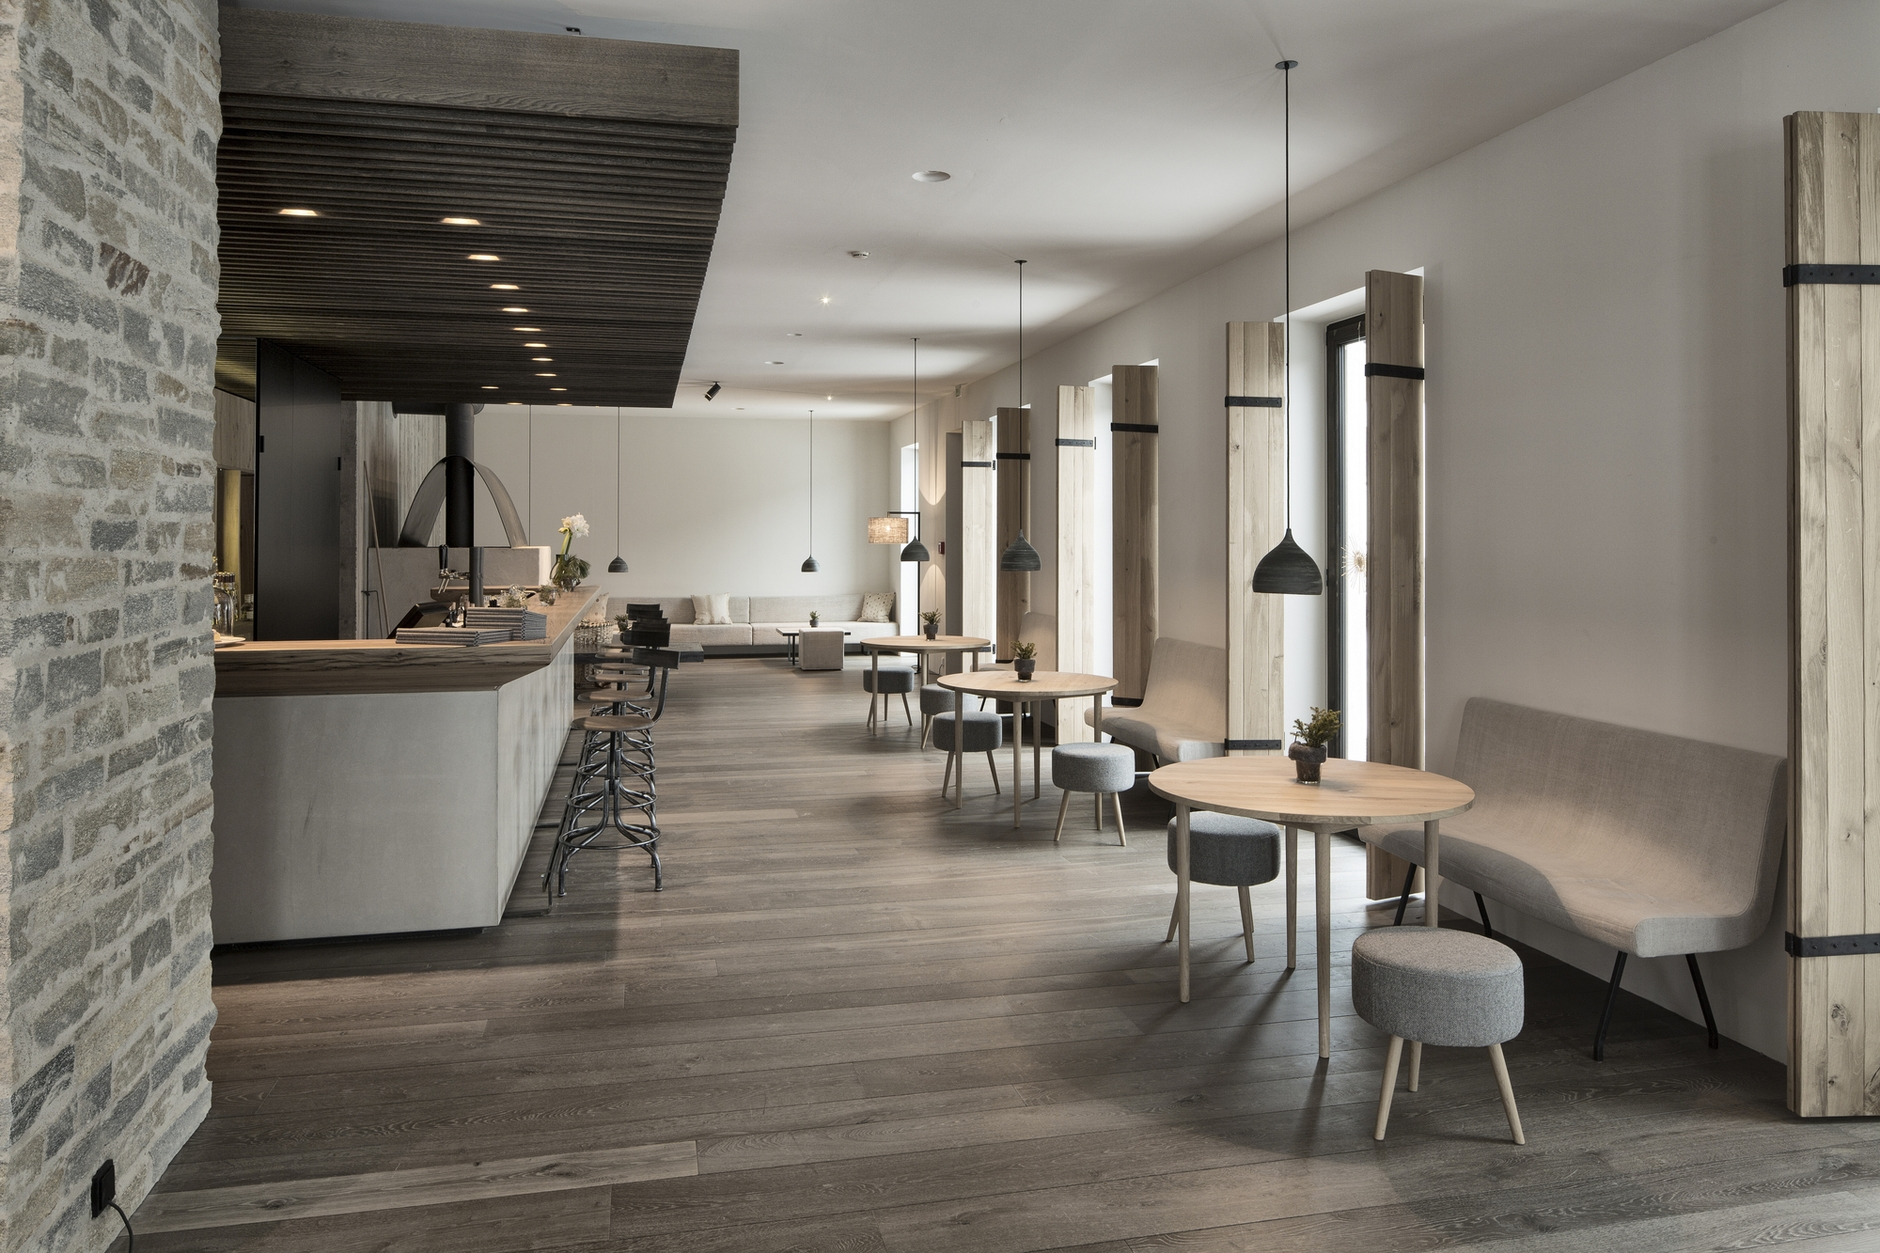 hotel wiesergut by gogl architekten karmatrendz